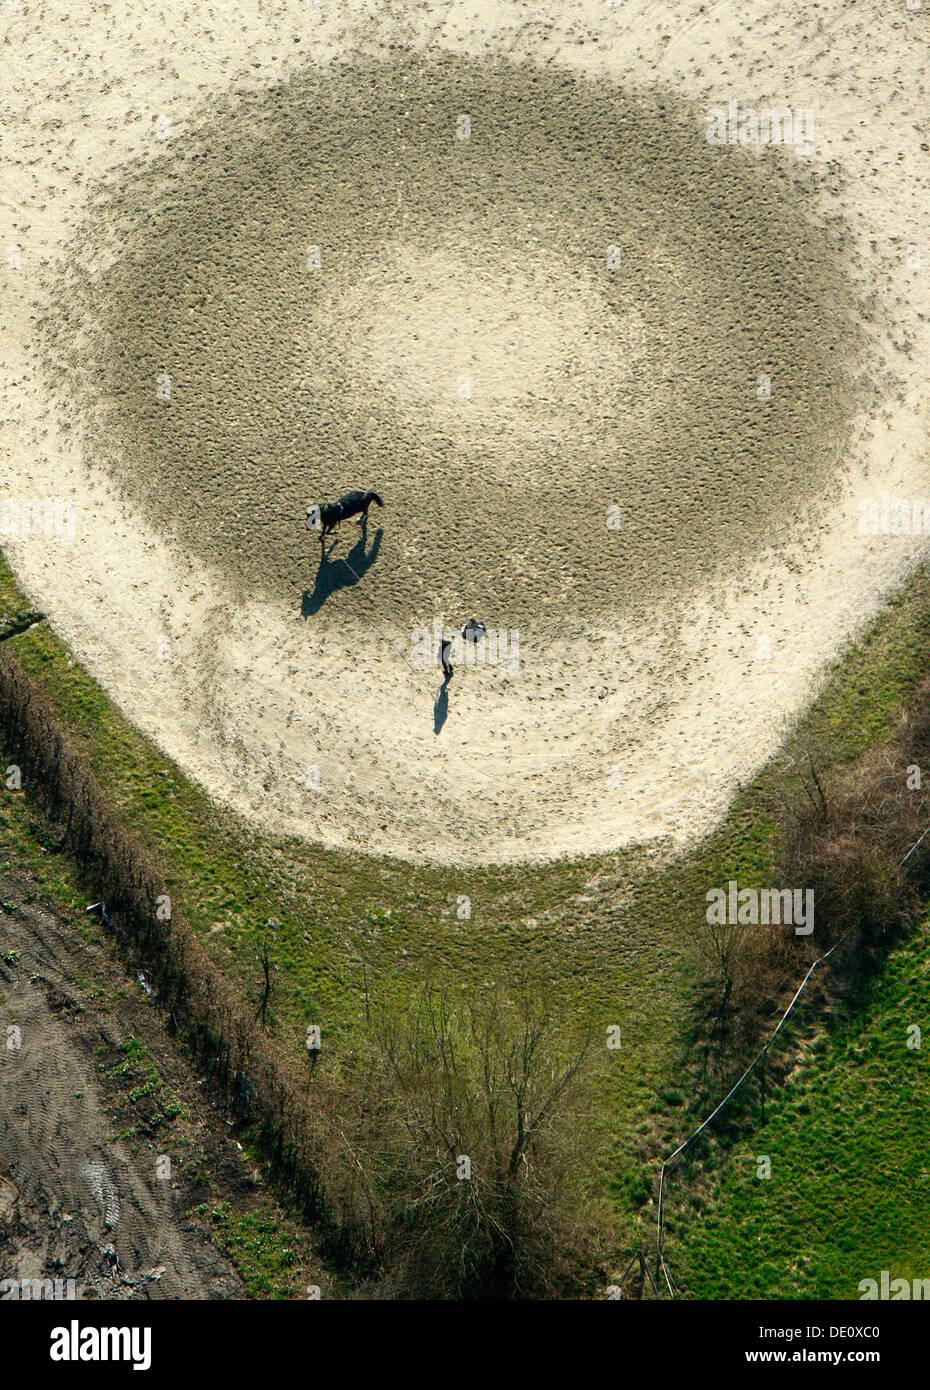 Aerial view, equestrian facility, vaulting, Kamen, Ruhrgebiet region, North Rhine-Westphalia - Stock Image